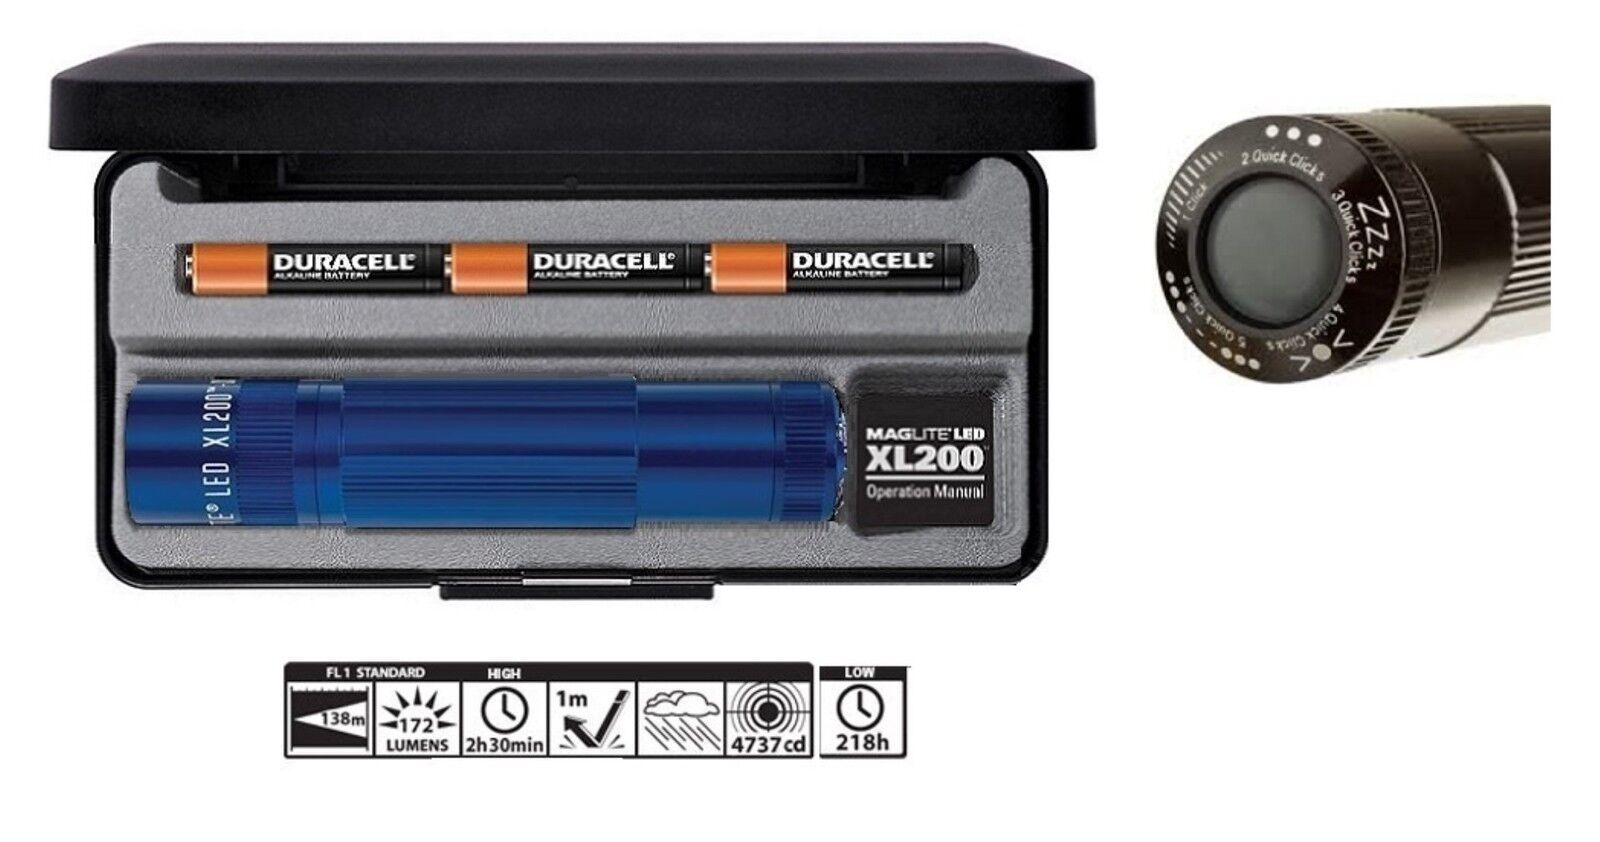 Mag lite  XL200 torcia led-5 usi  strobo-sos-nite lite-signal-hiht power(172 L.)